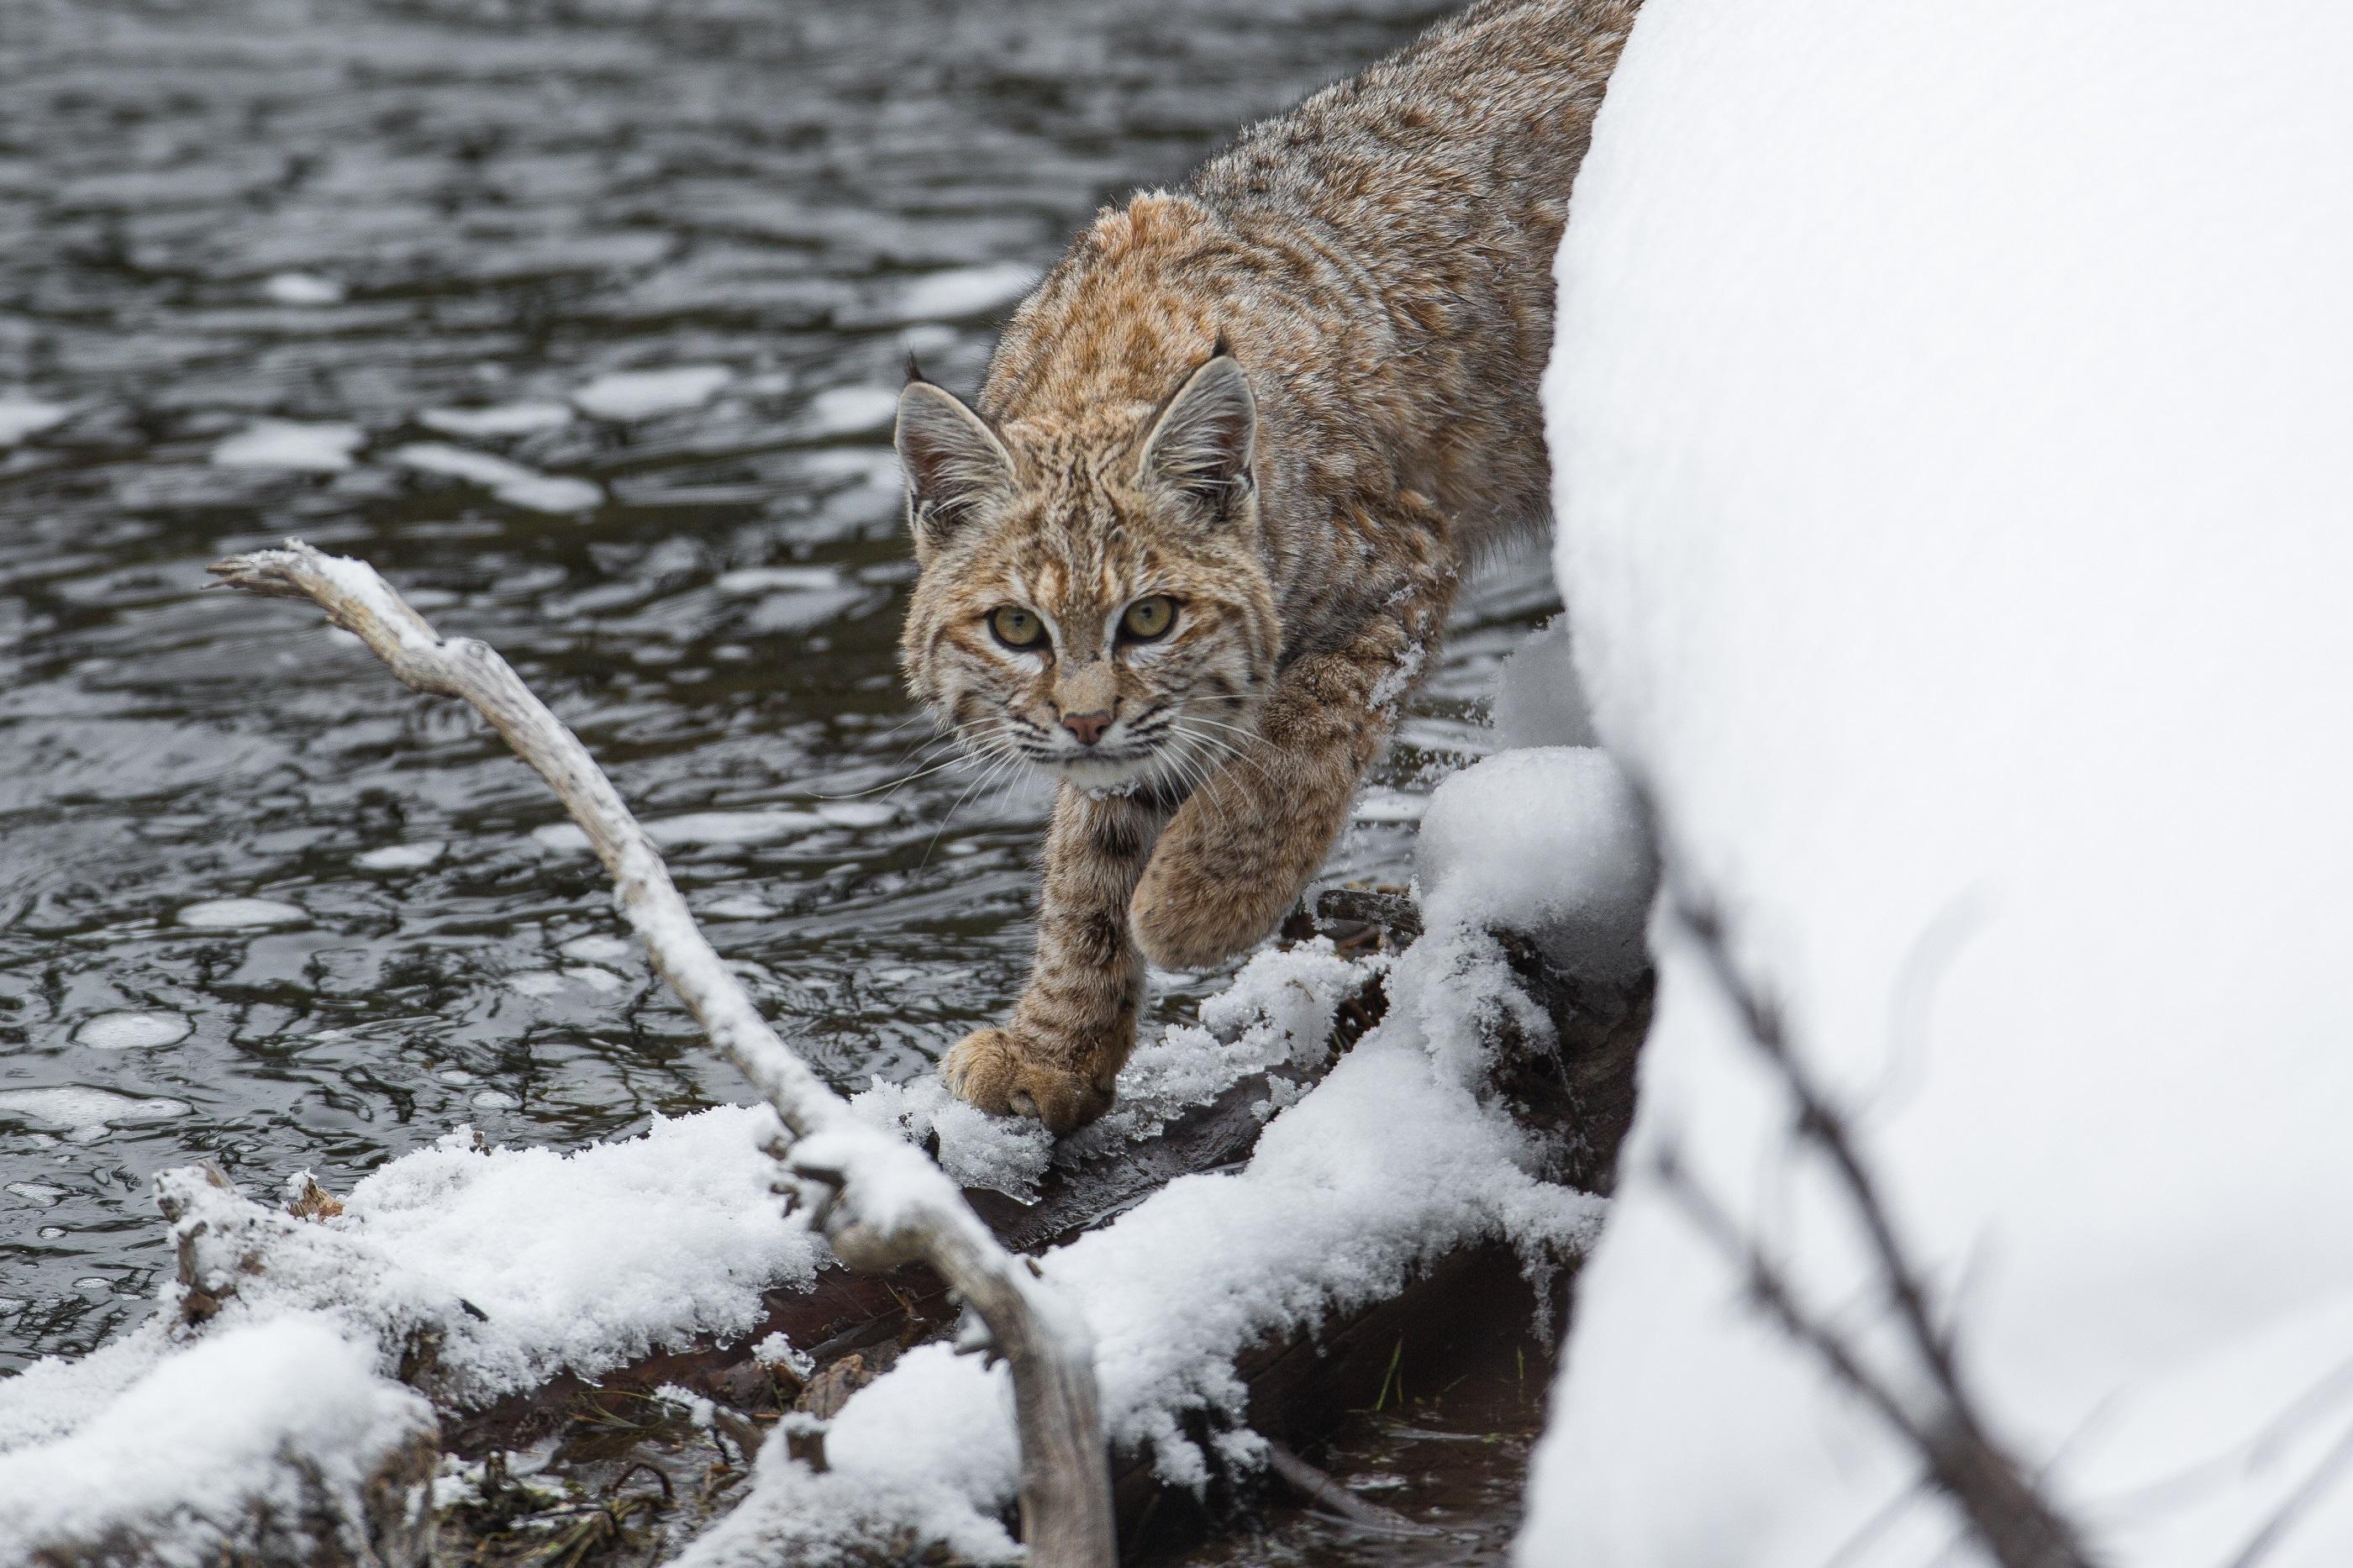 Download mobile wallpaper Predator, Iris, Animals, Snow for free.